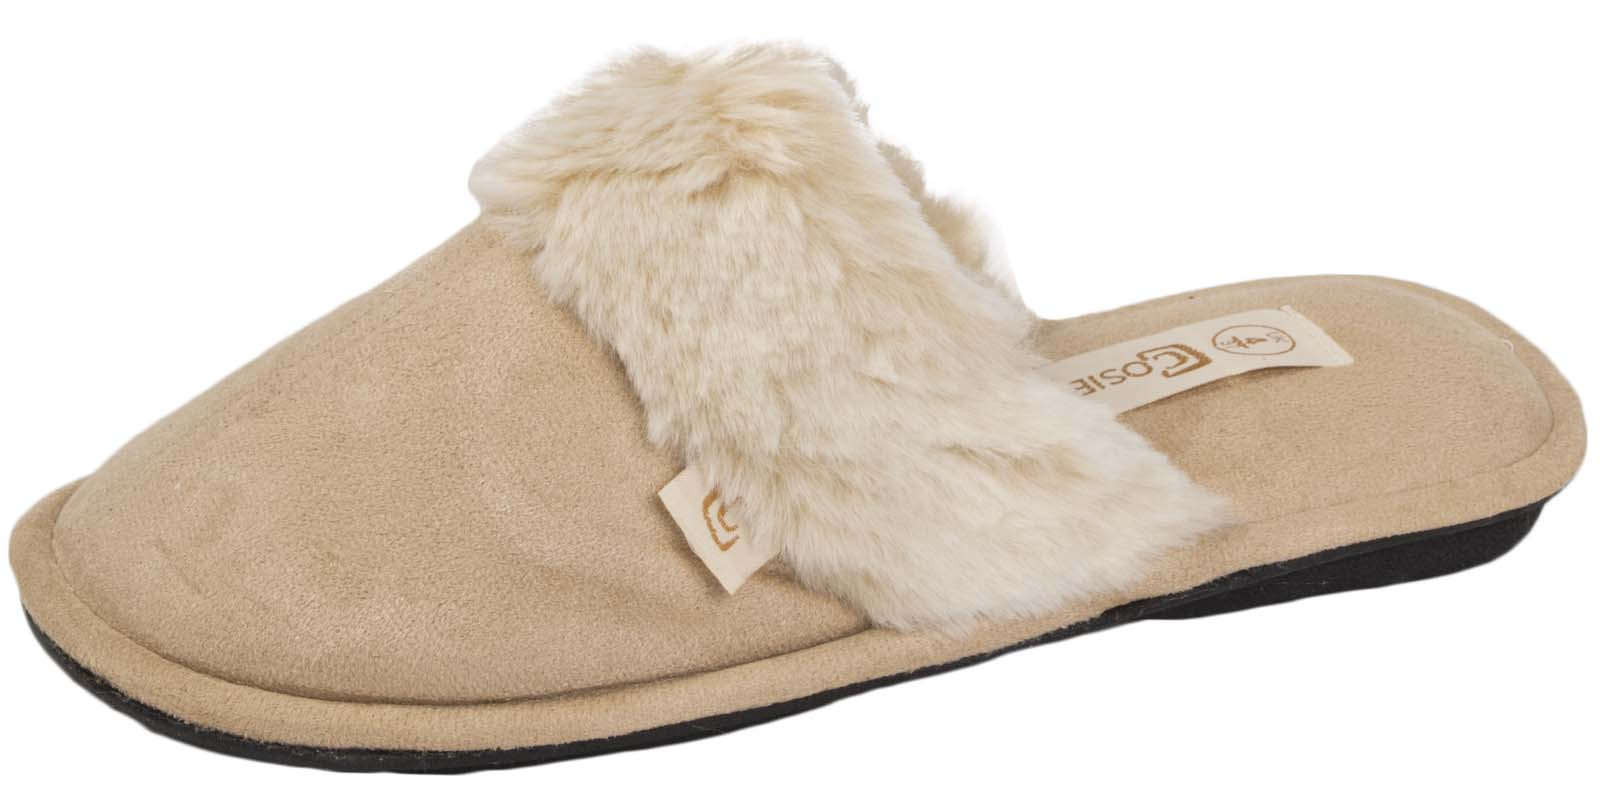 Ladies Faux Fur Trim Mule Slippers Womens Slip On House Shoes Birthday Xmas Gift